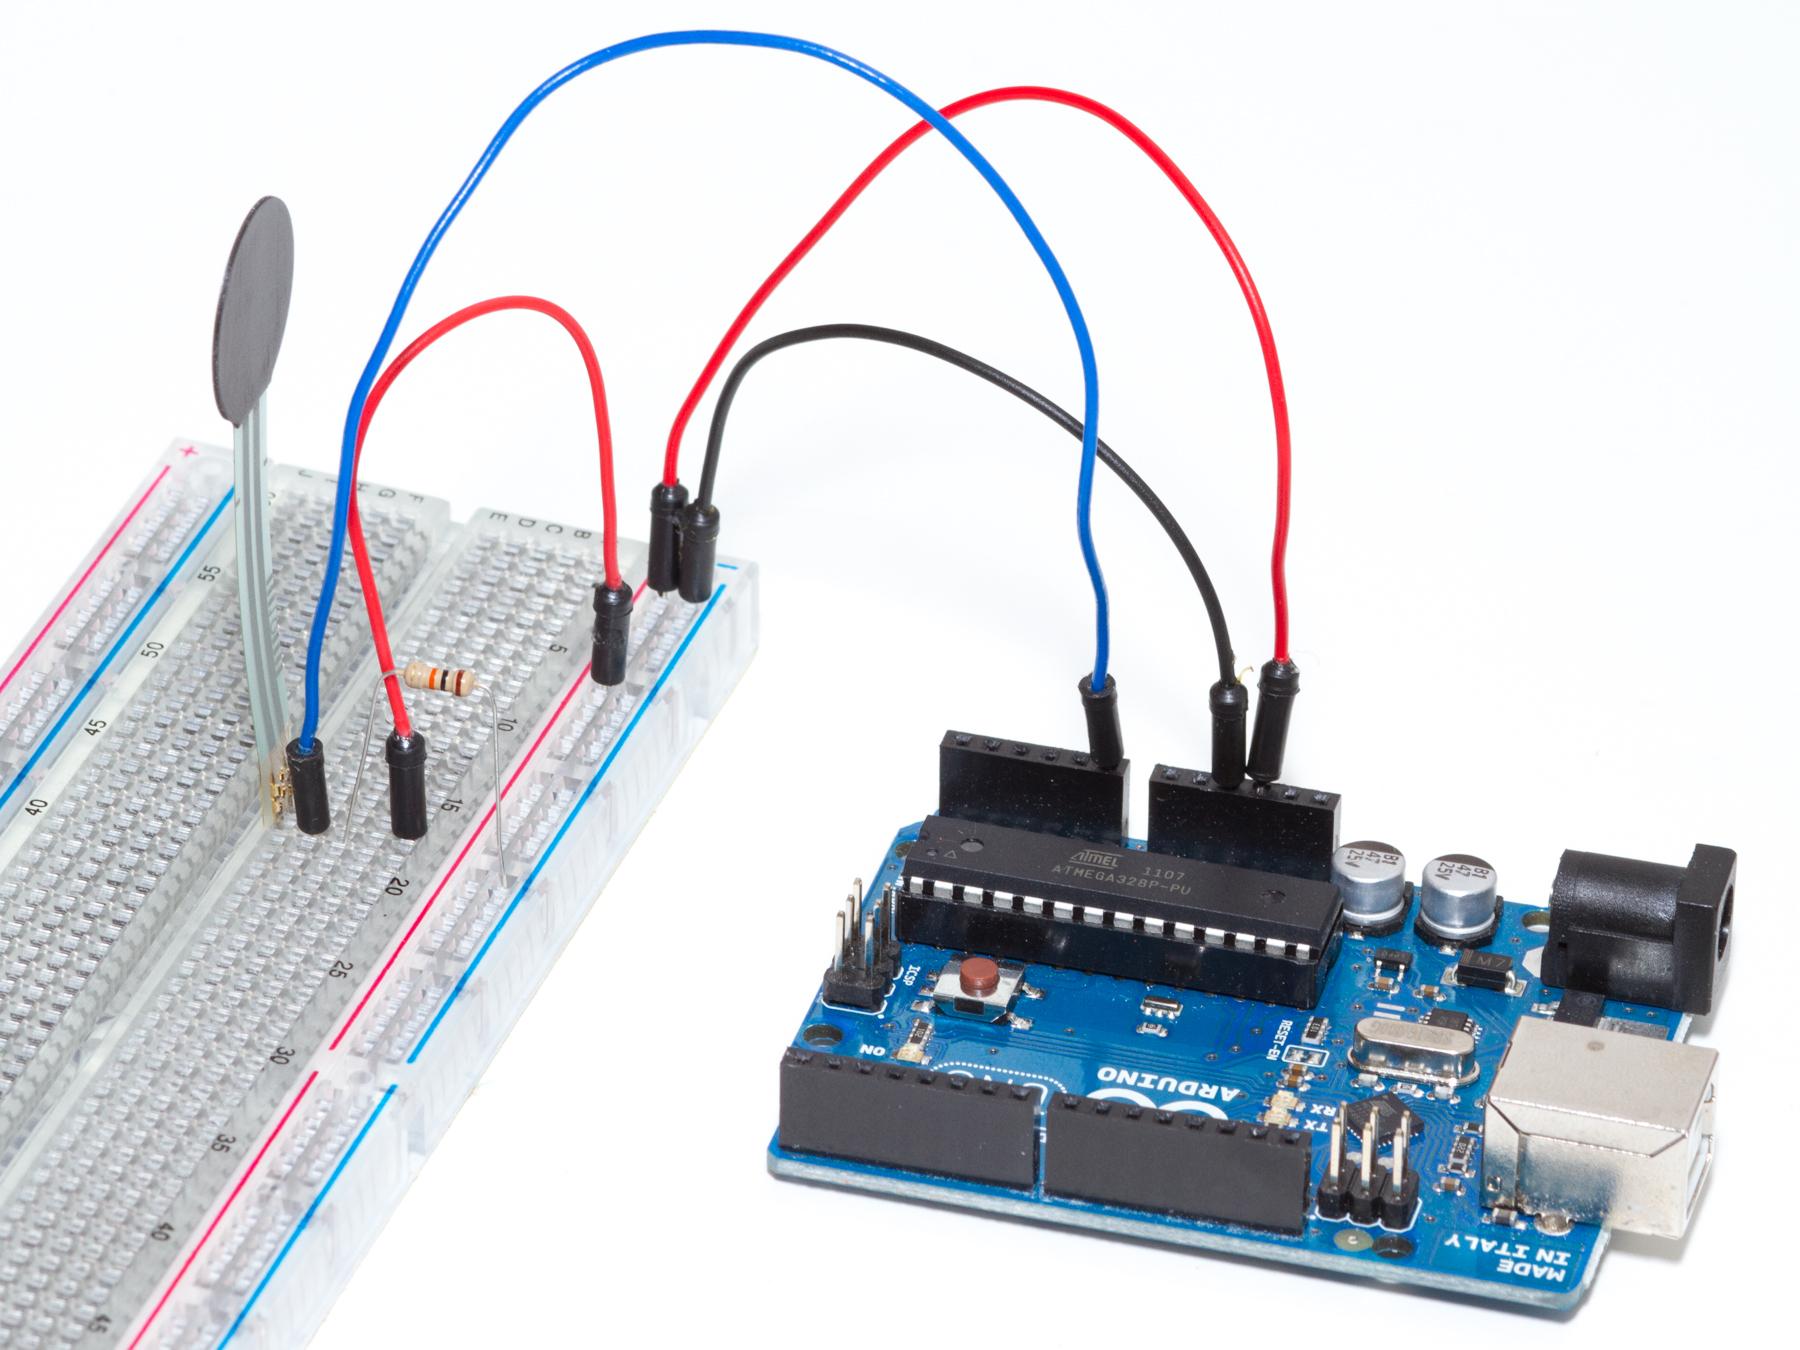 Control a Servo with a Force-SensitiveResistor